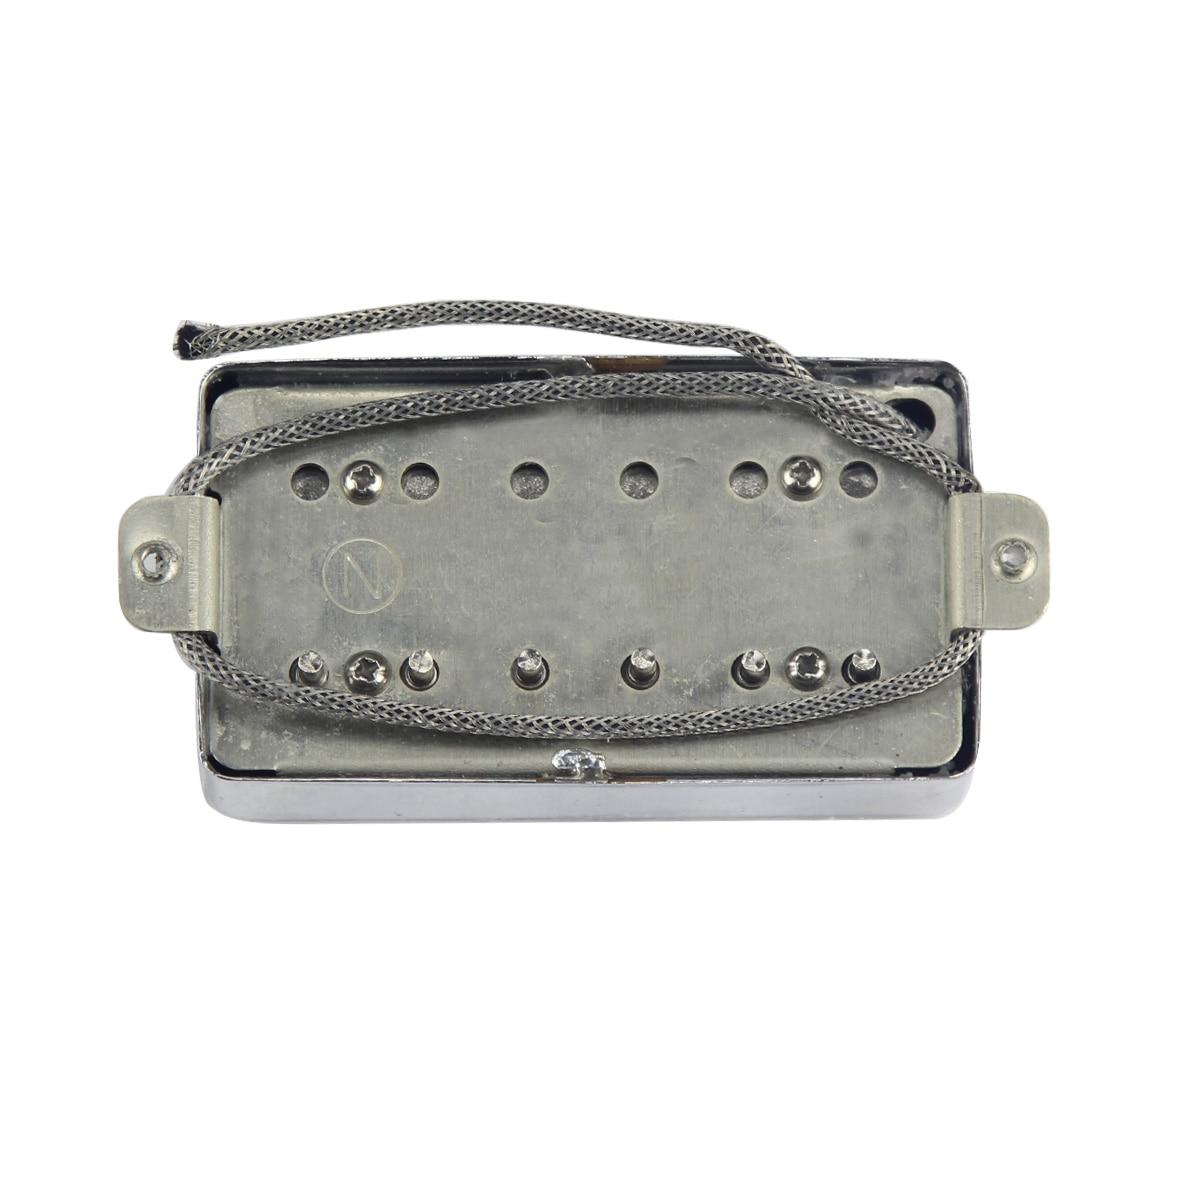 Image 4 - NEW Alnico 5 / V Humbucker Electric Guitar Pickup Chrome Neck or Bridge Pickup Choose For LP Style GuitarGuitar Parts & Accessories   -